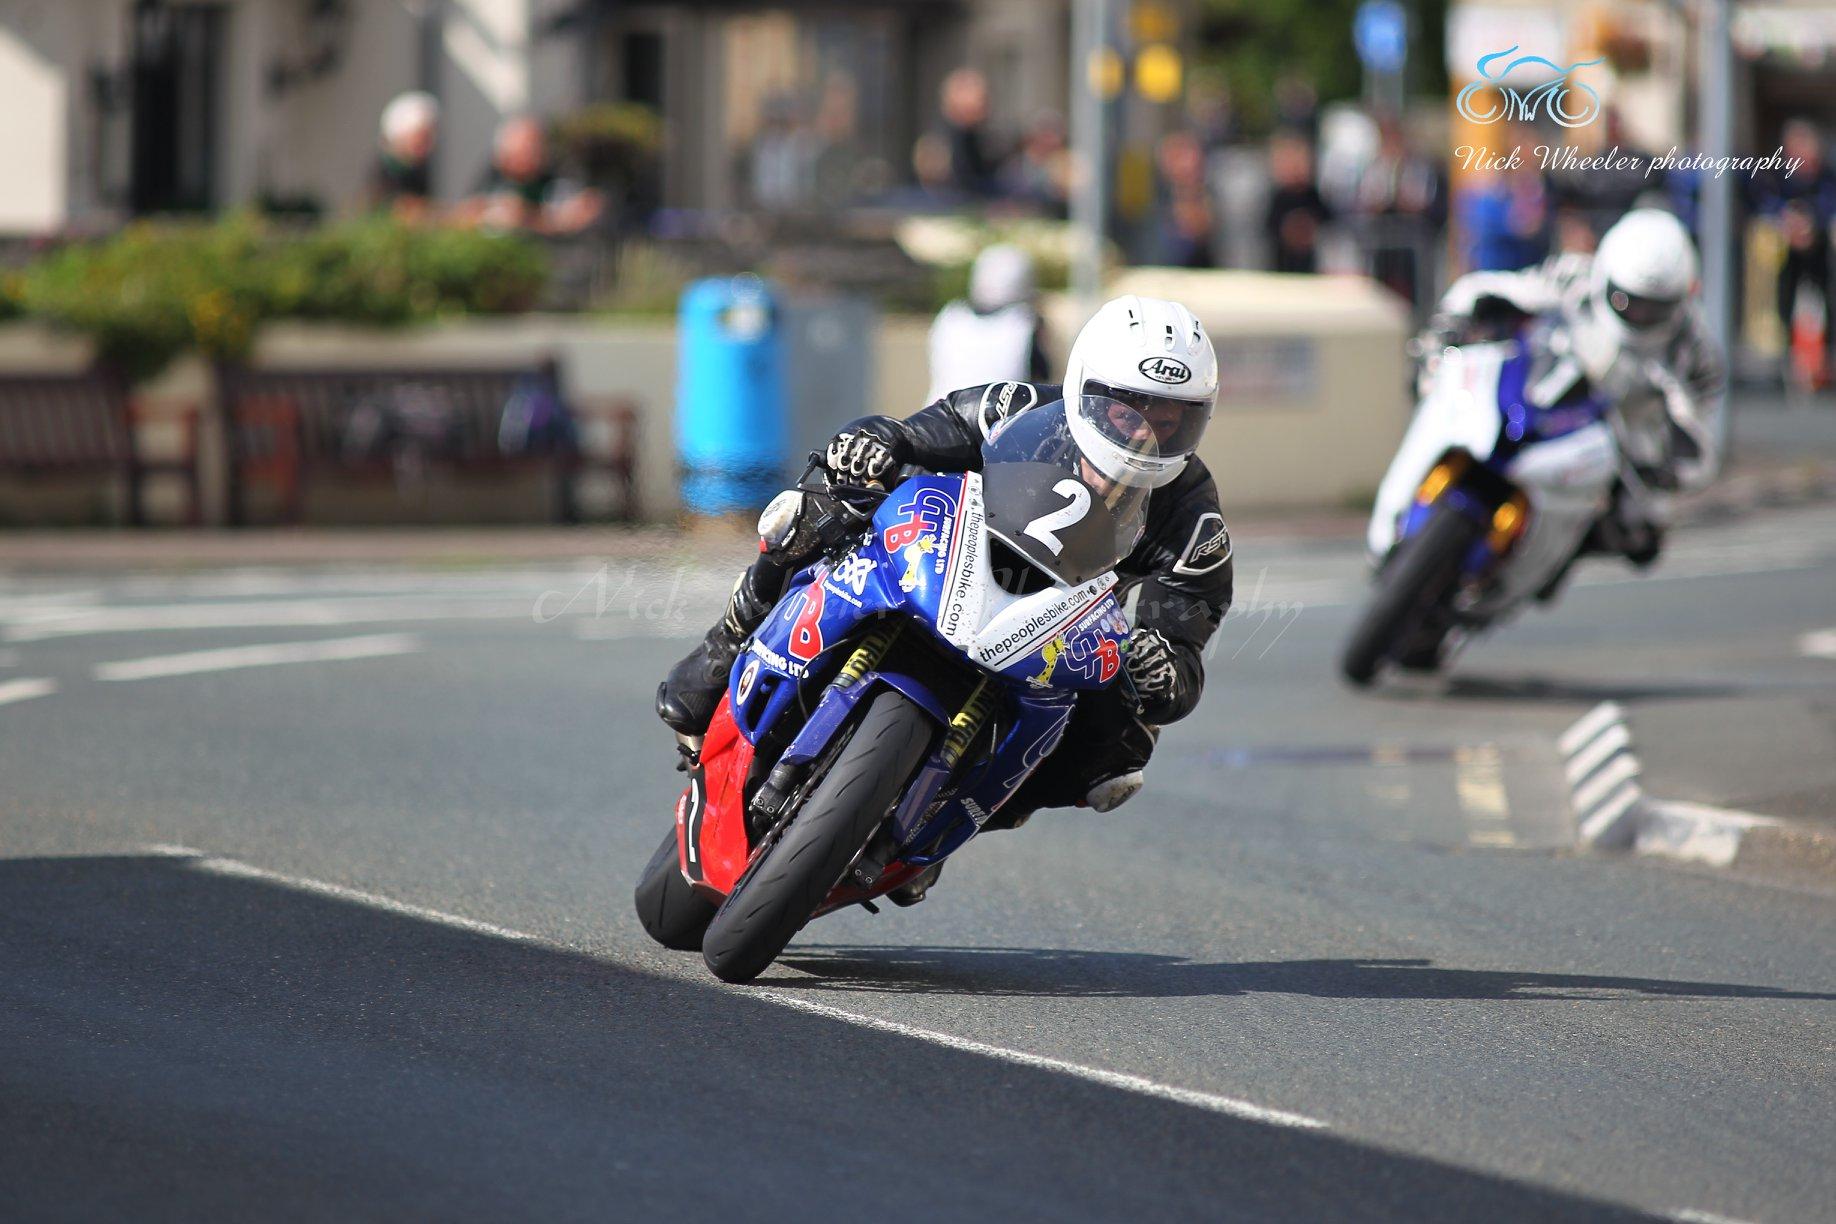 Manx GP Top 6: Stephen Parsons